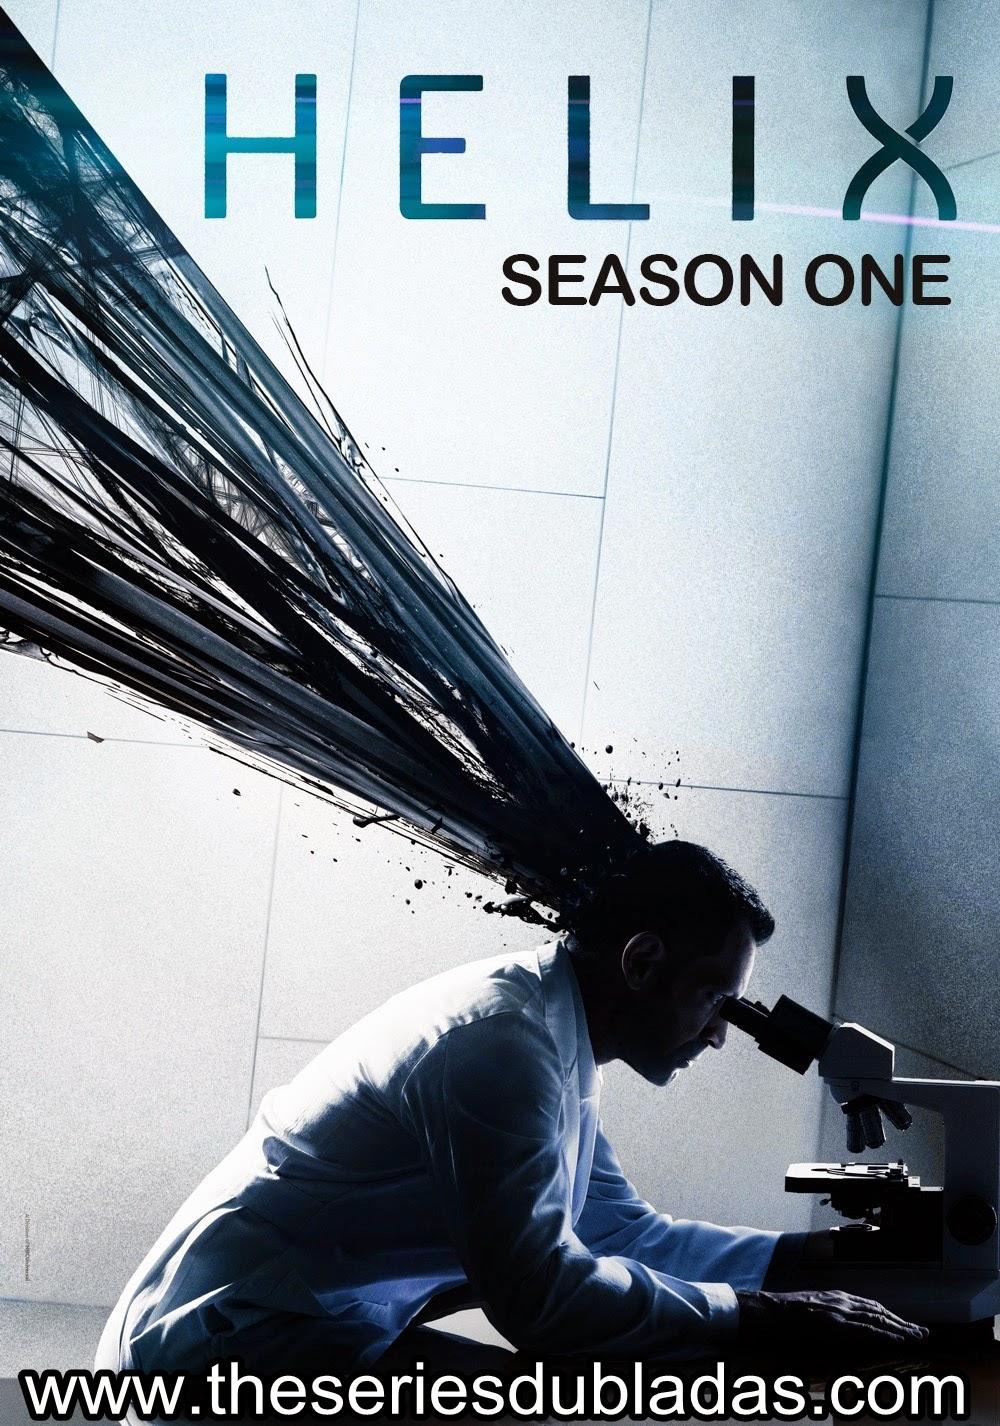 Rick and morty 3 temporada dublado download mp4 | Rick and Morty